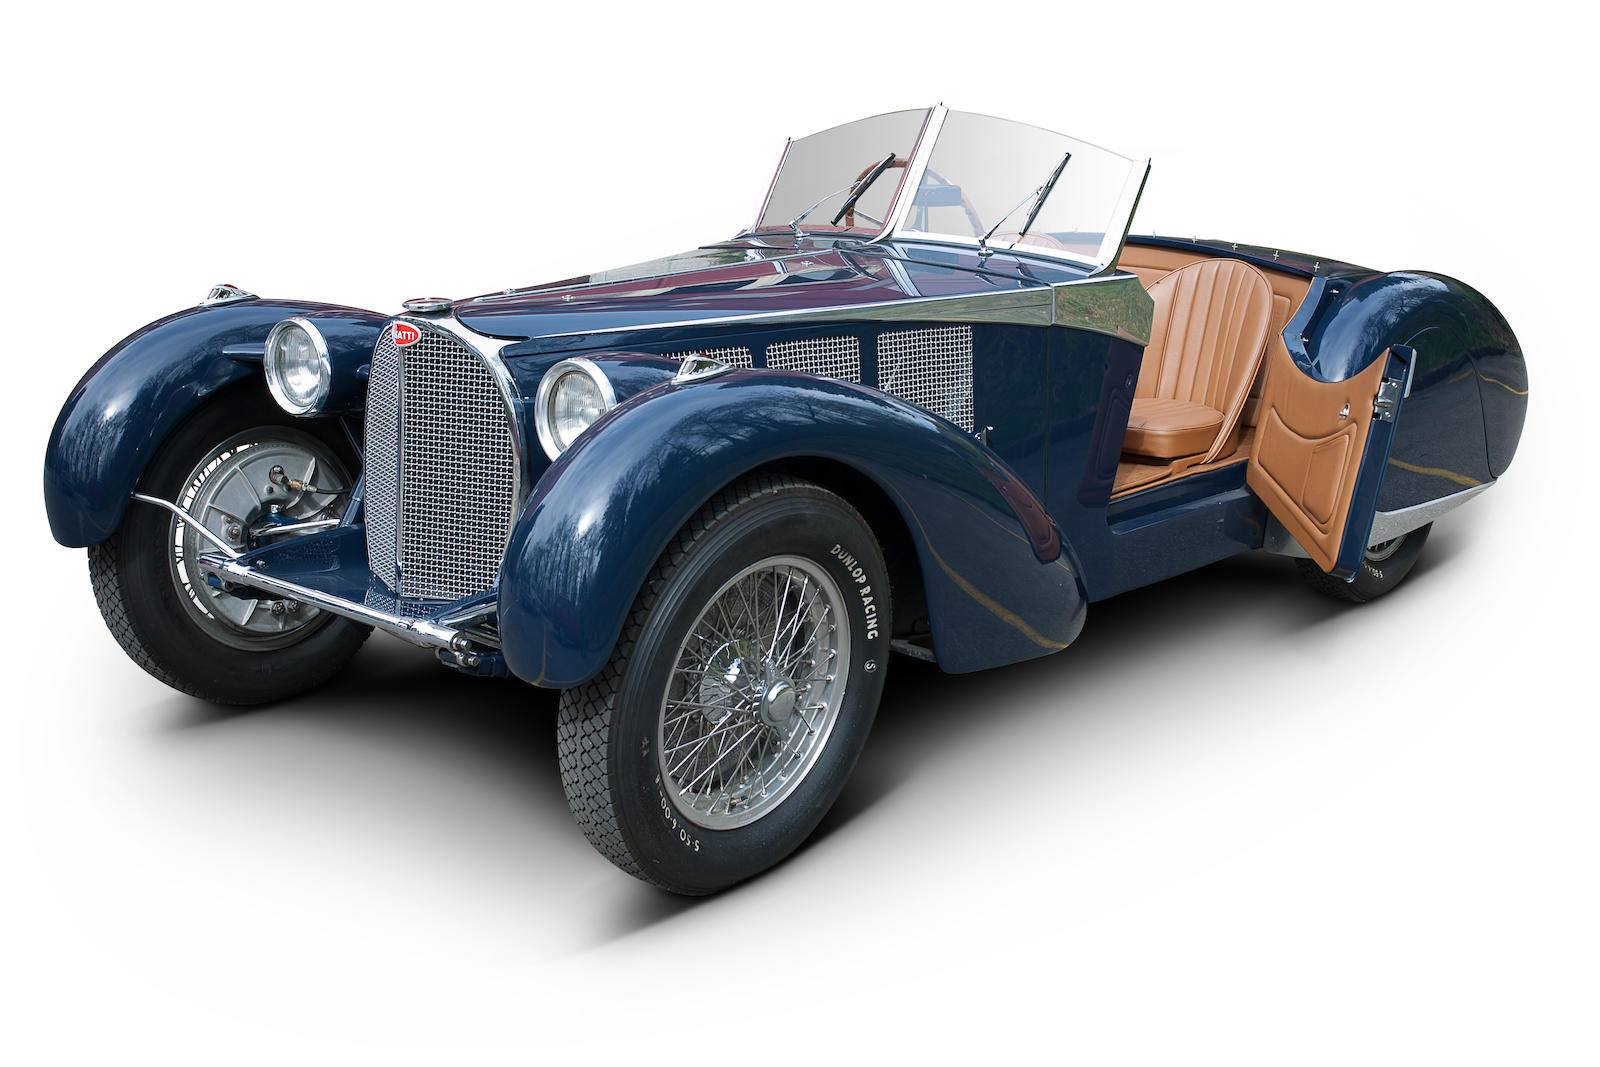 Bugatti-Type-57C-Casar-Special-Roadstar--1938-8